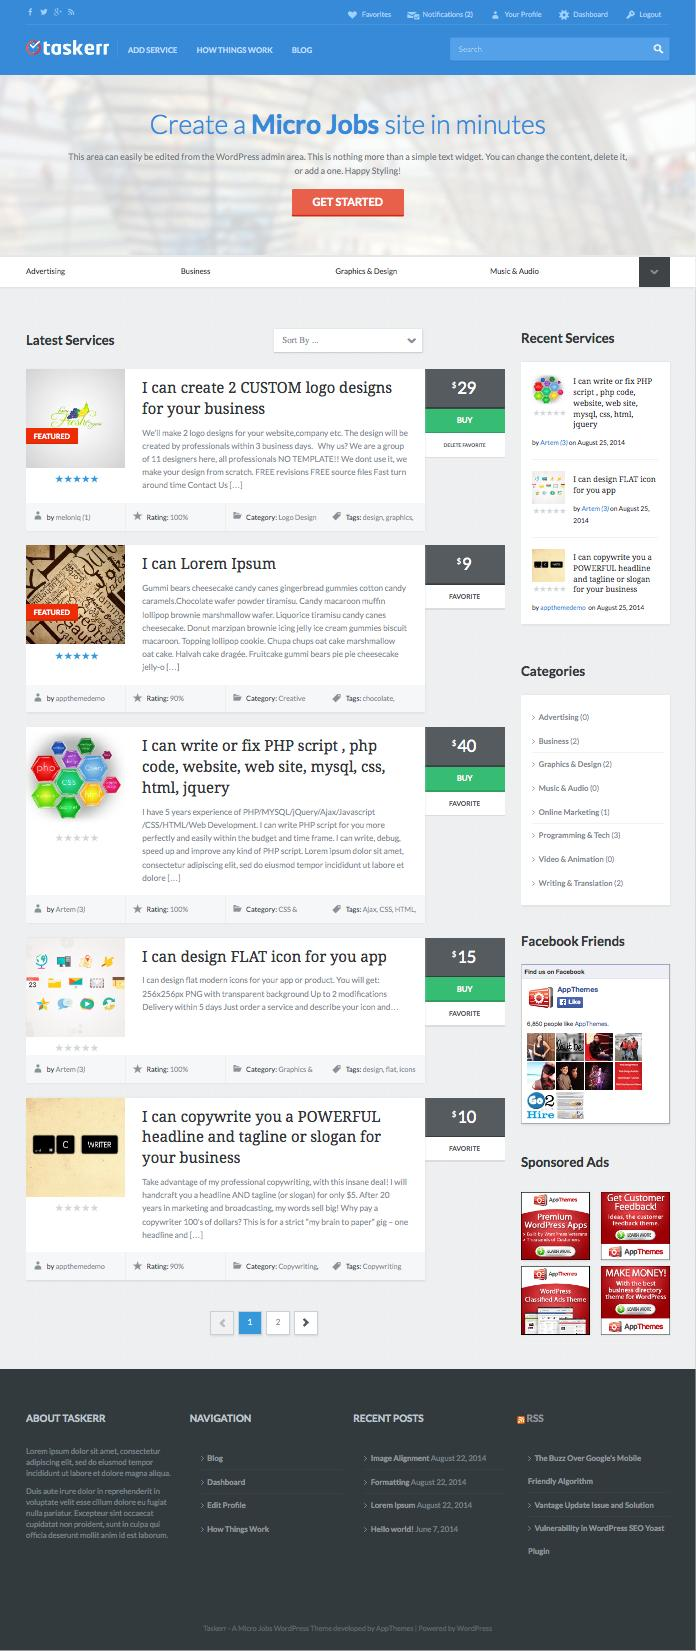 Taskerr WordPress Theme like Fiverr and PeoplePerHour